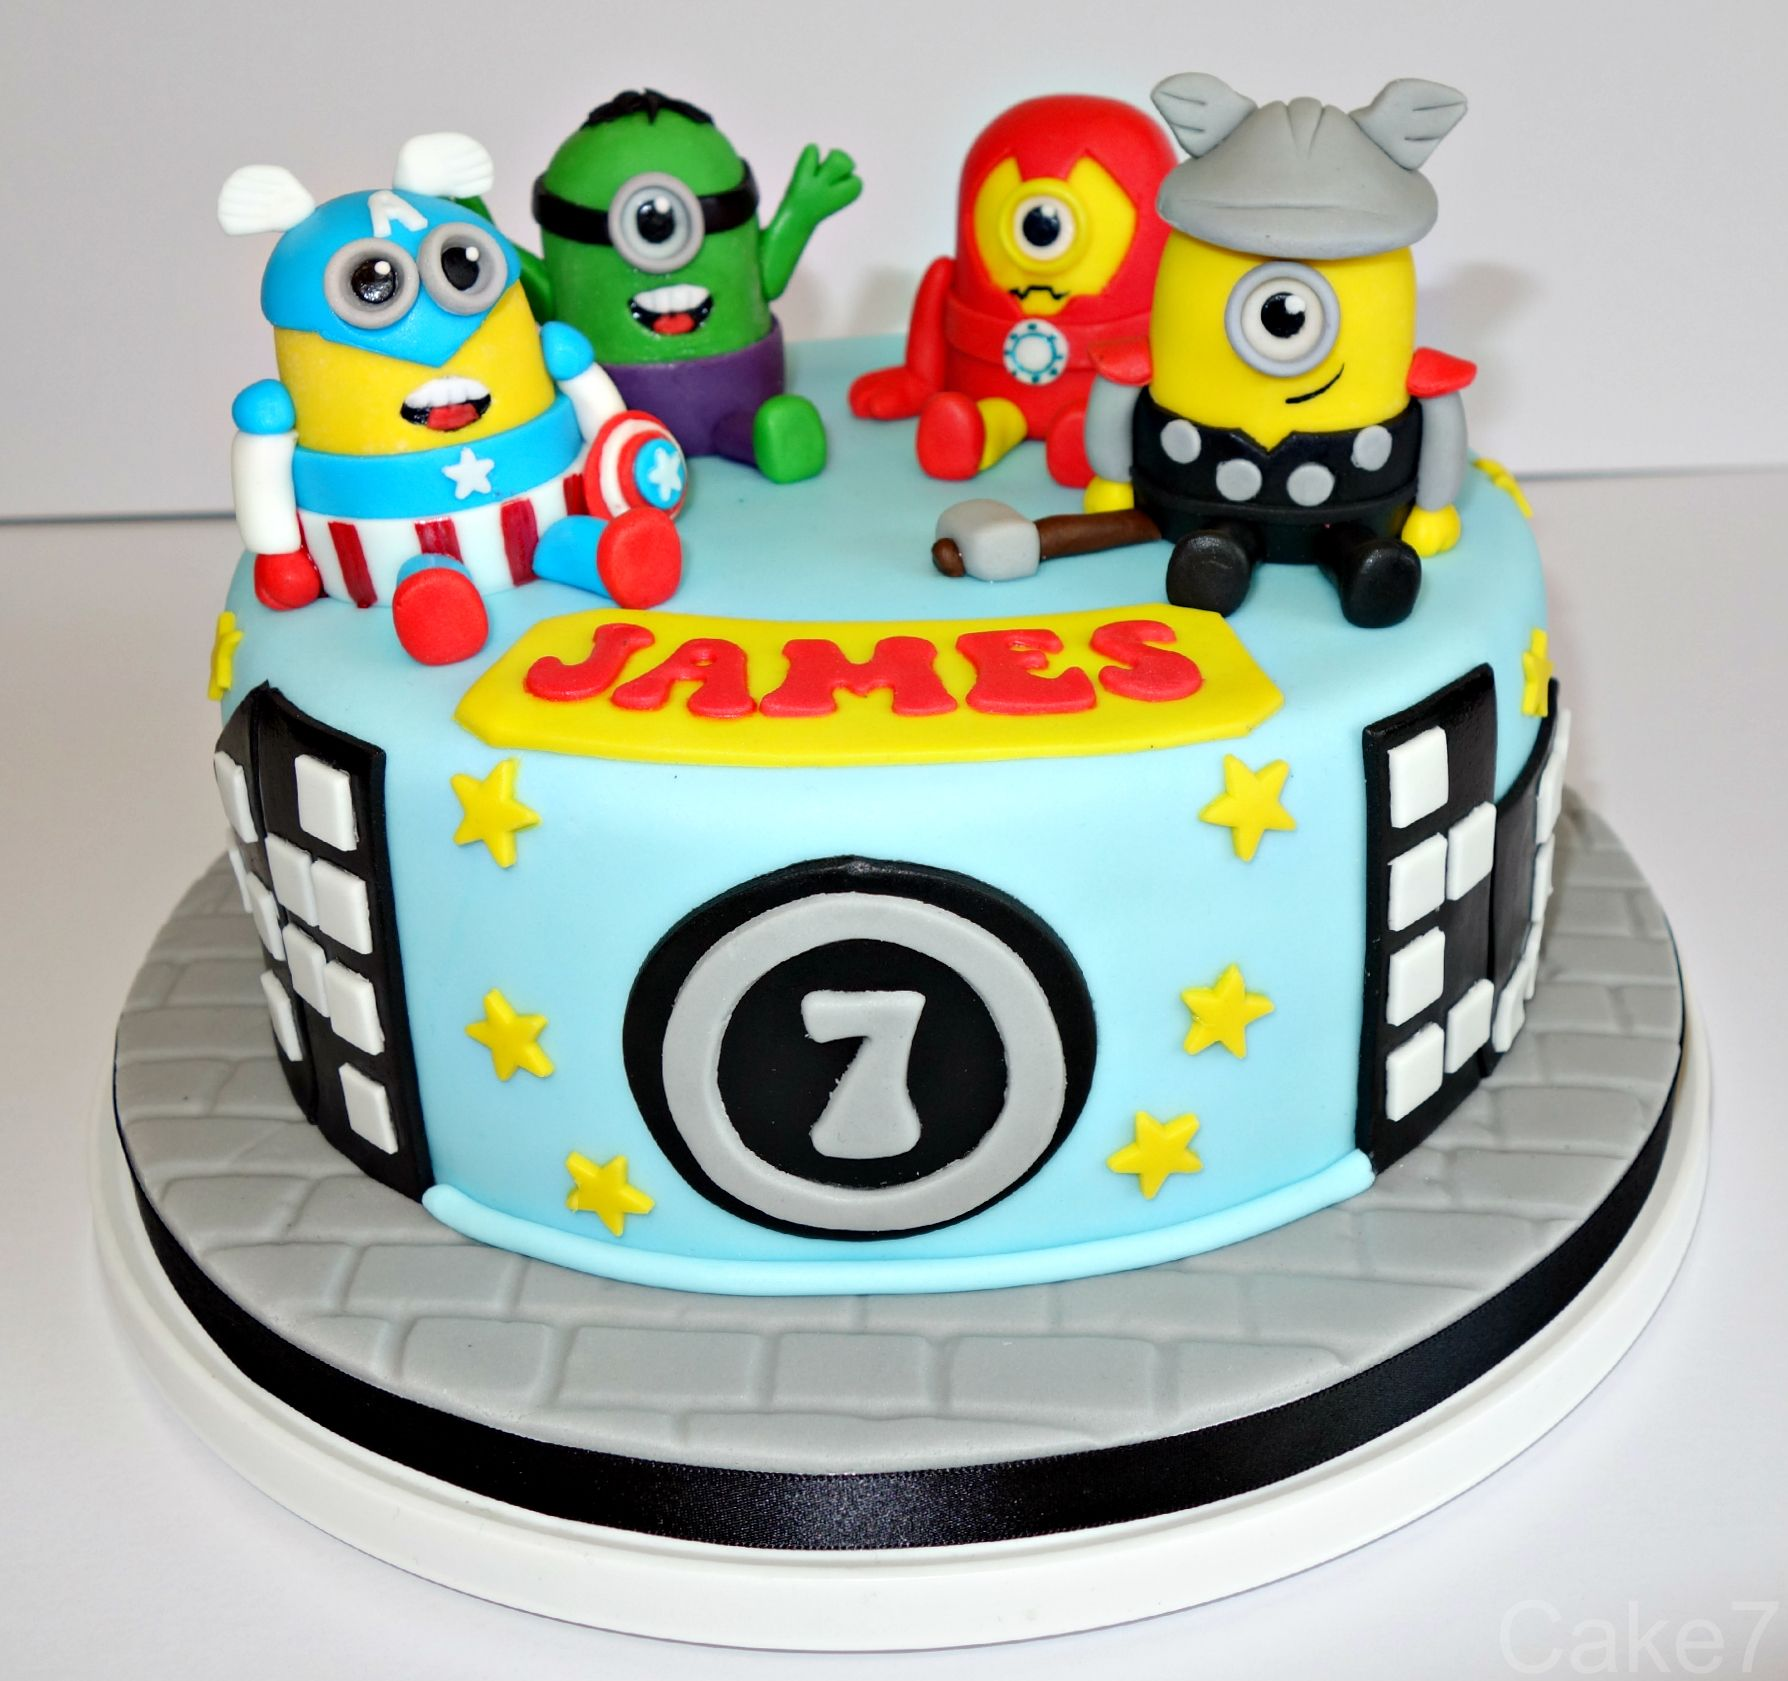 Minions Avengers themed cake wwwcakesevenwix Facebook Cake7